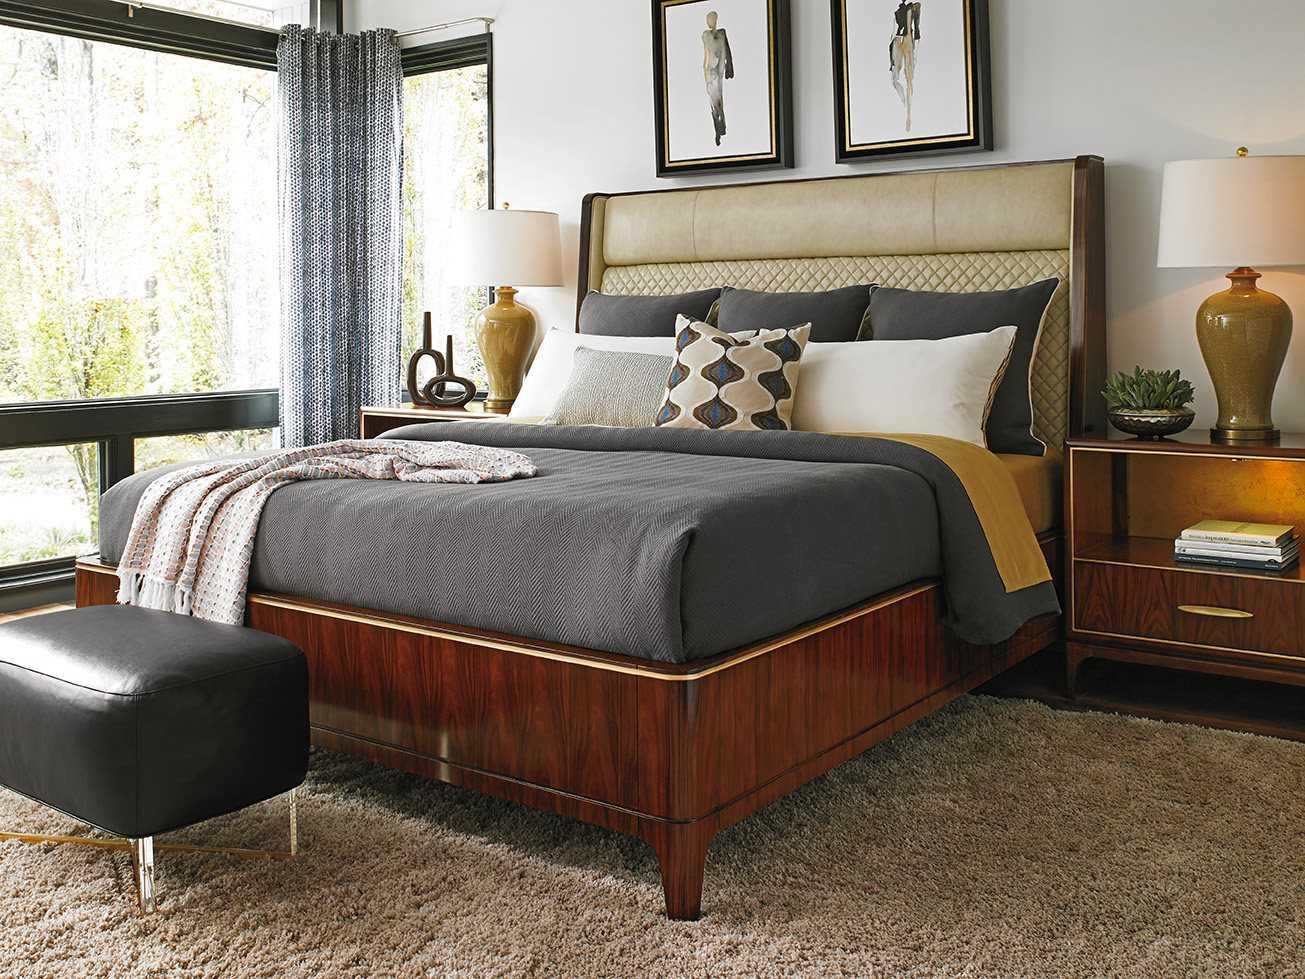 Lexington Take Five Bedroom Set Lx010723143cset